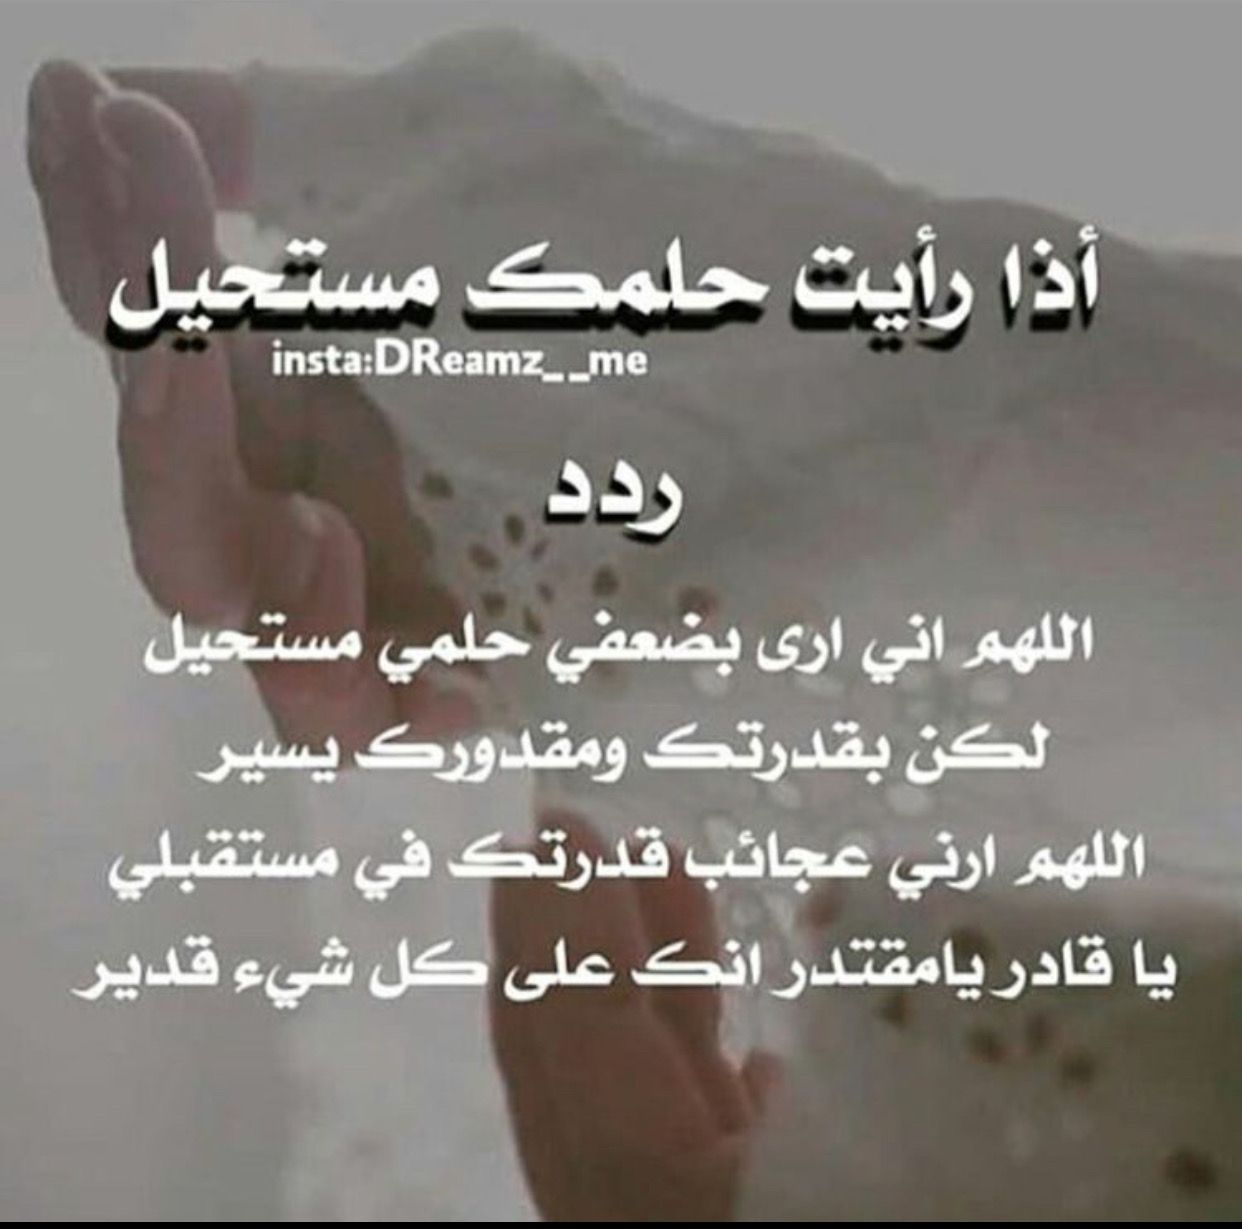 Desertrose اللهم آااامين Quran Quotes Inspirational Islamic Inspirational Quotes Islamic Phrases